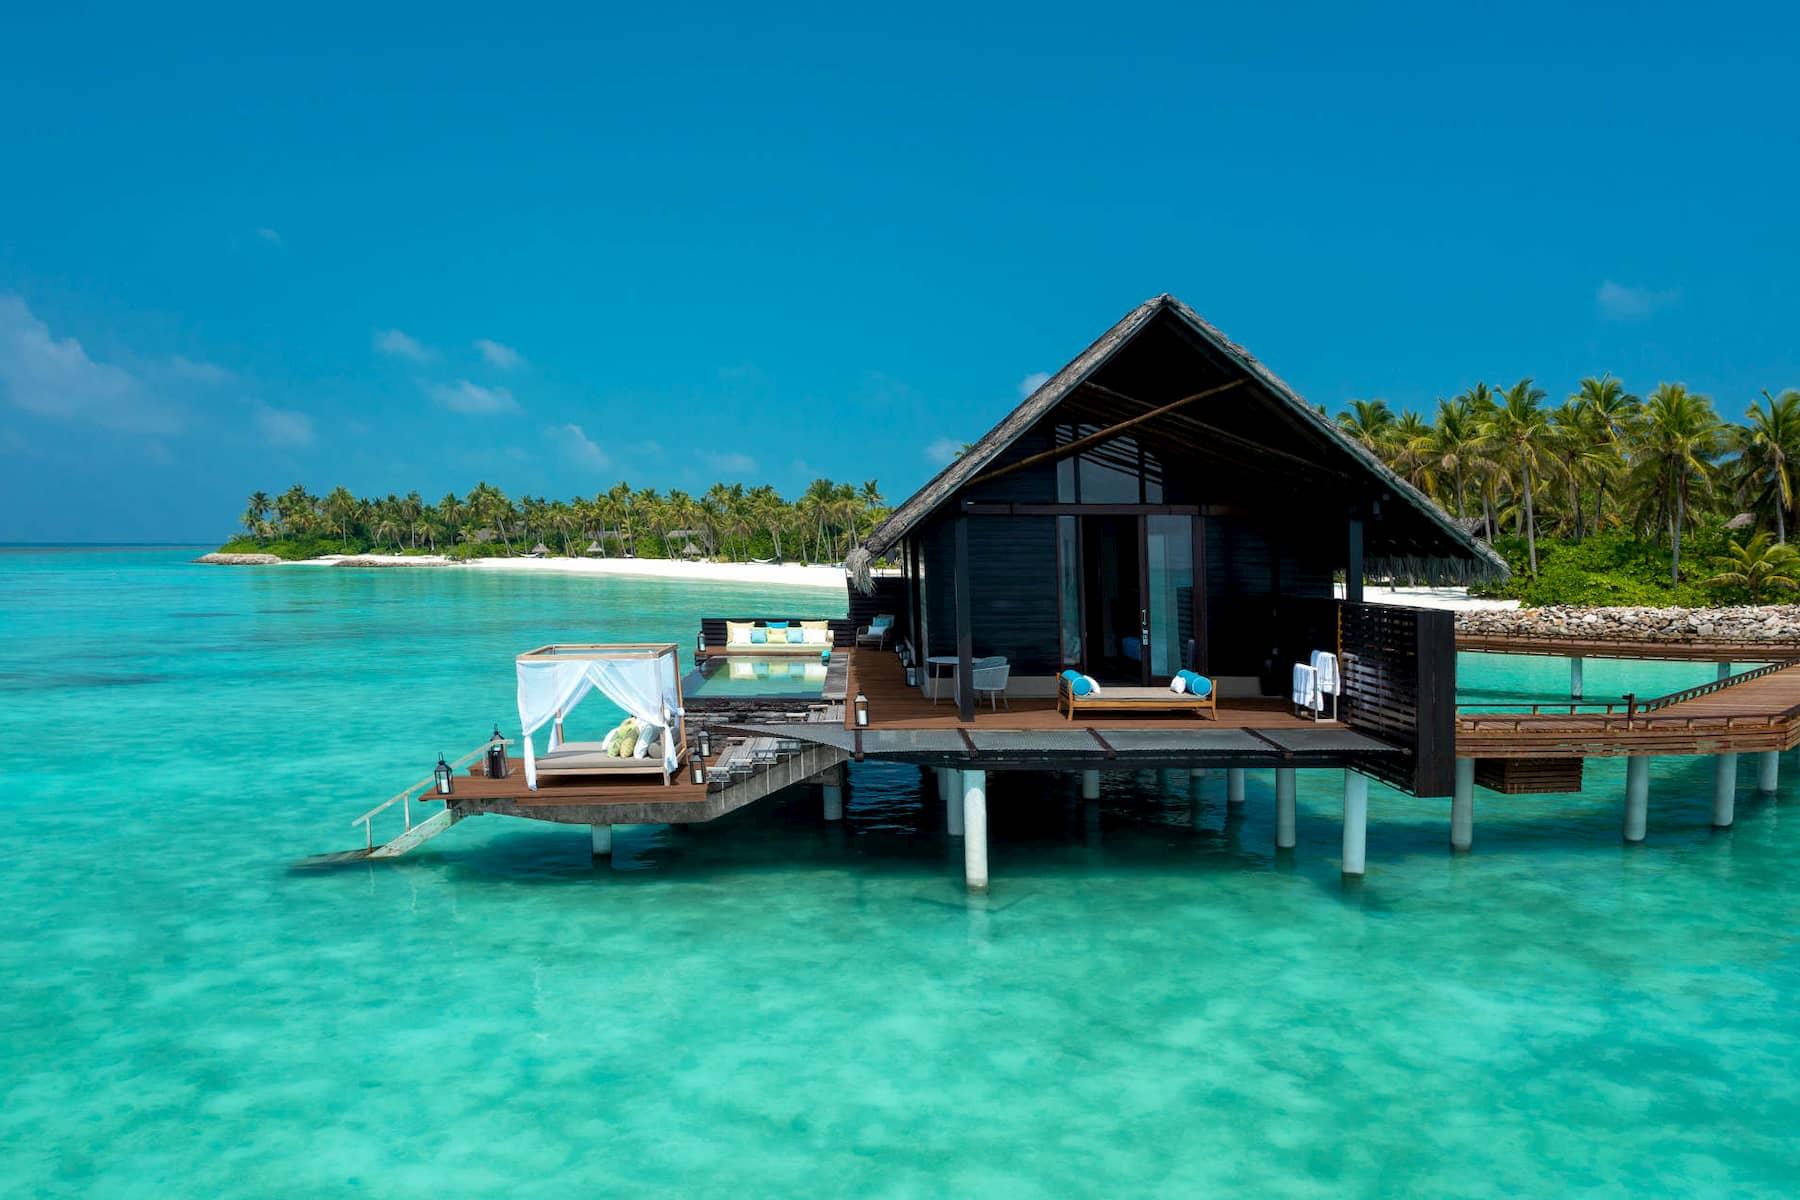 Resort Maldive One & Only Reehi Rah water villa with pool